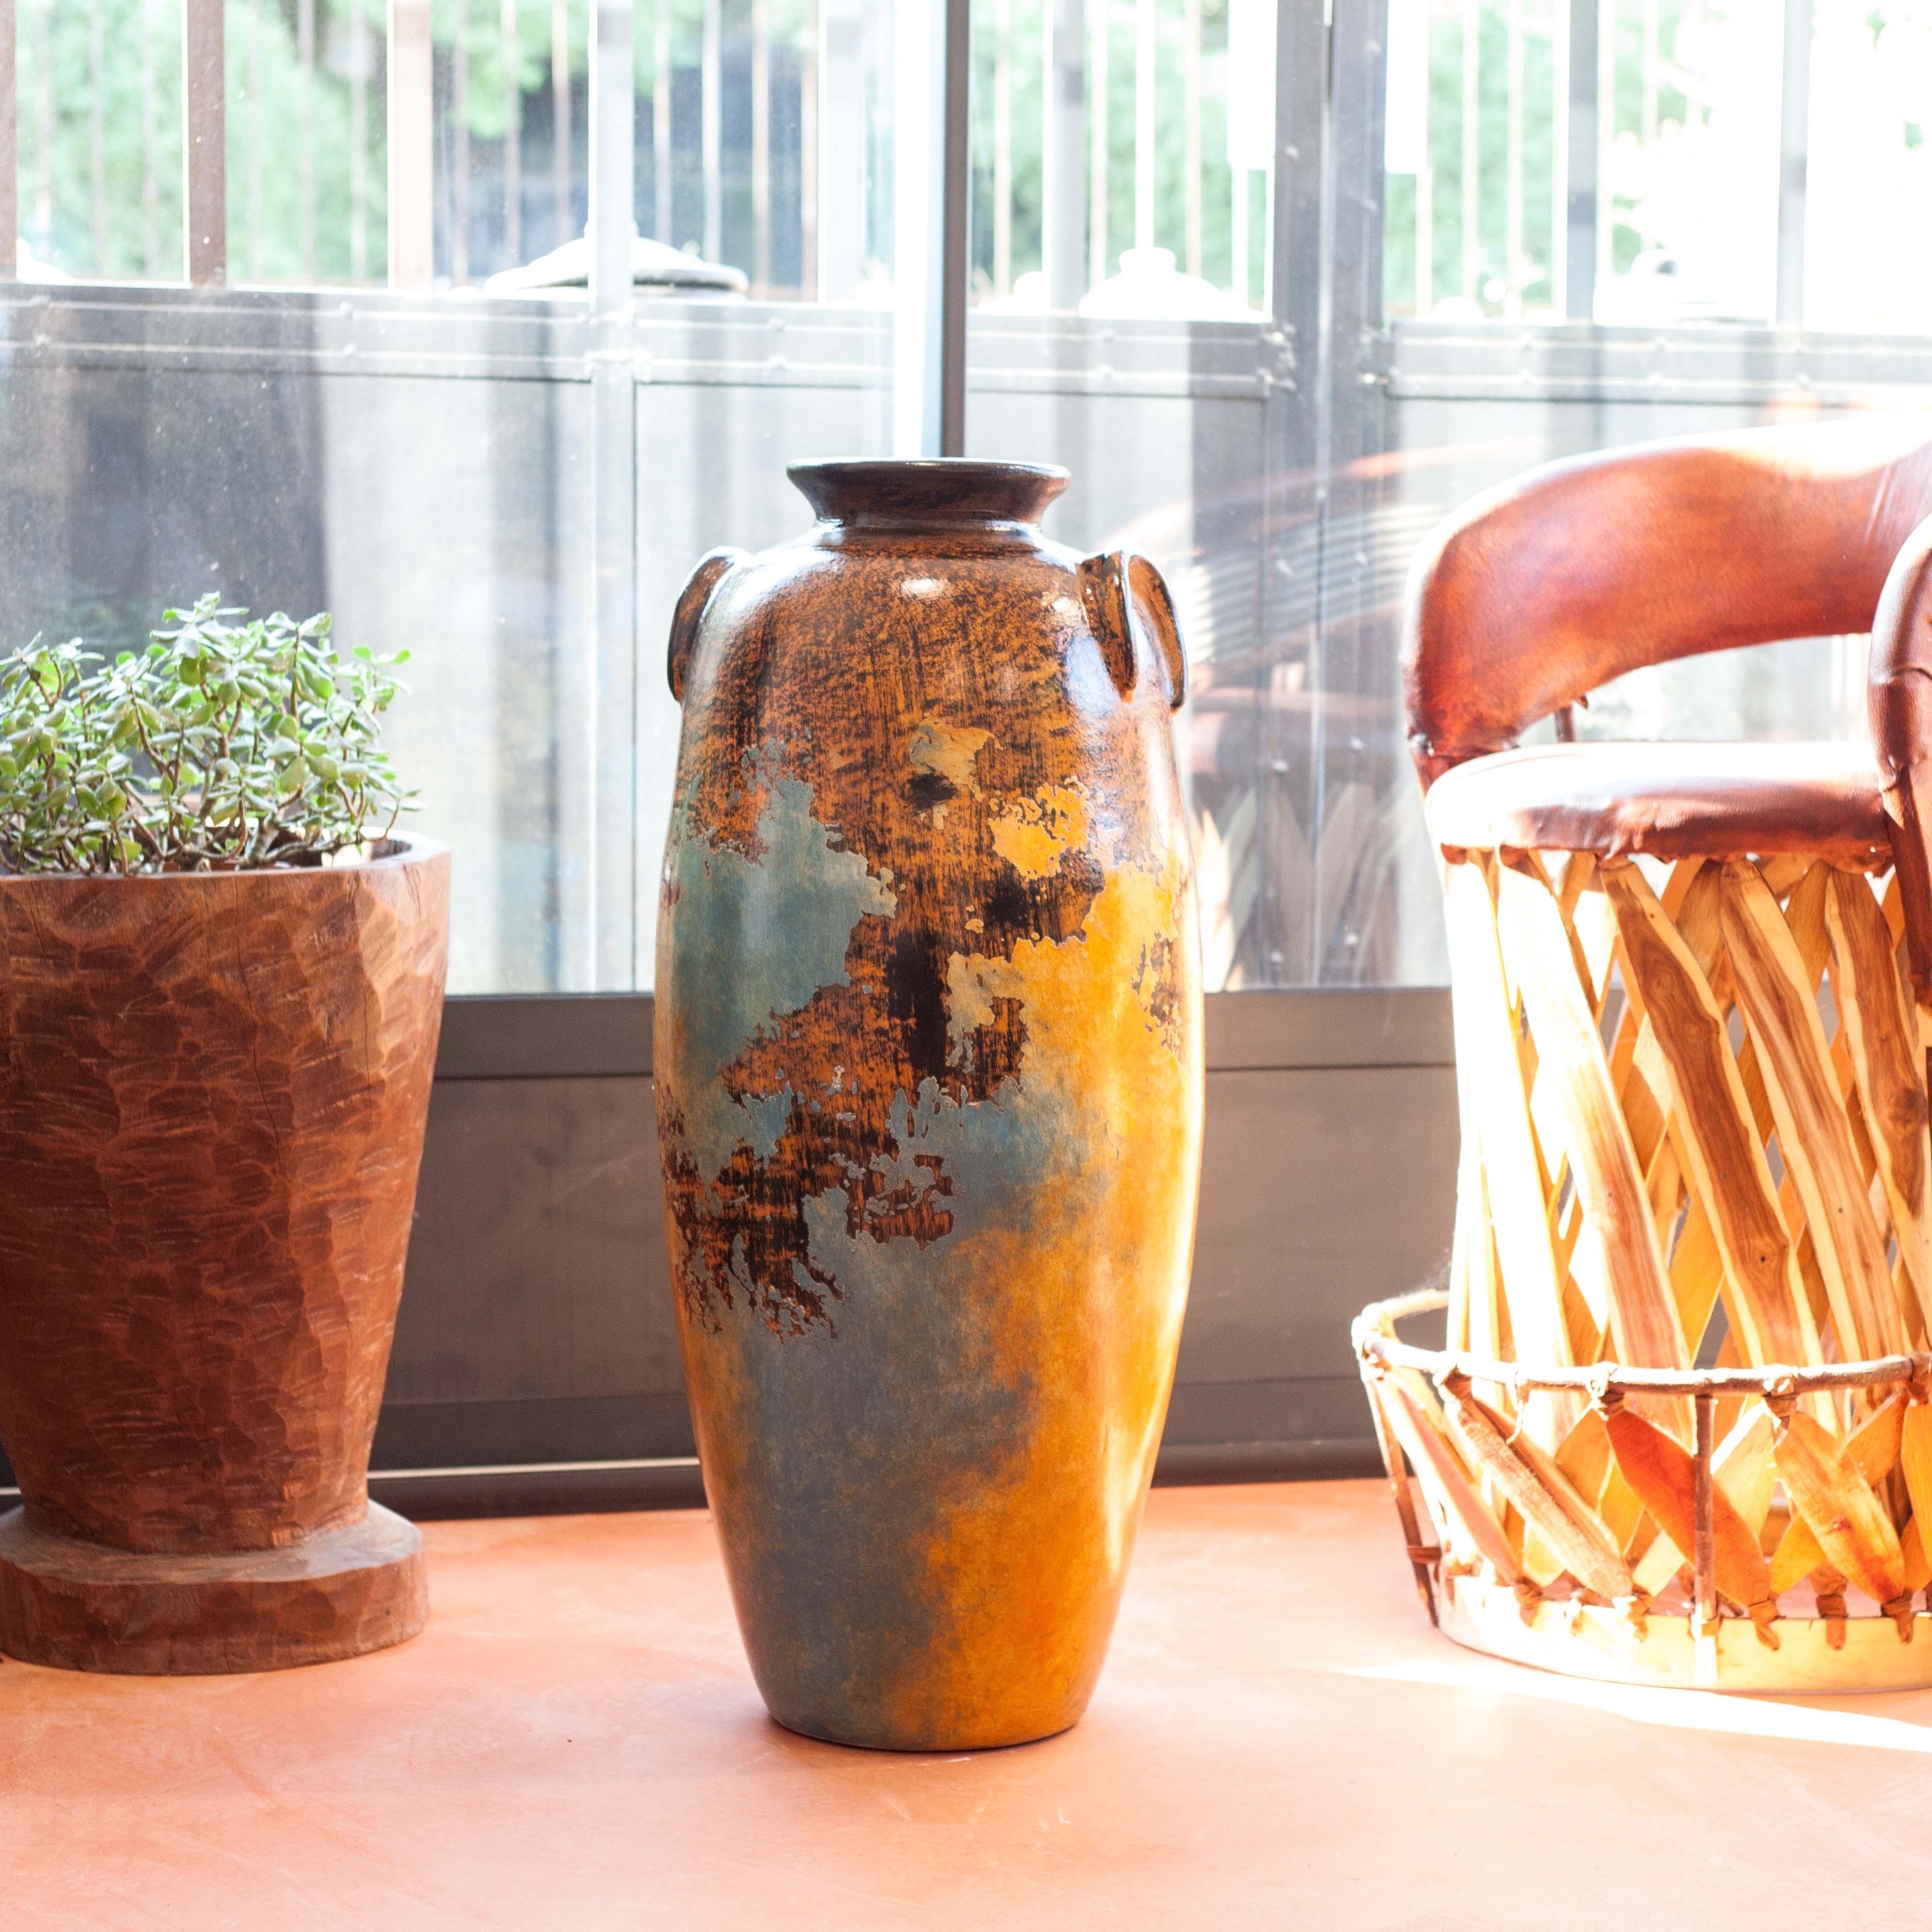 jarre-terre-cuite-deco-interieure-amadera